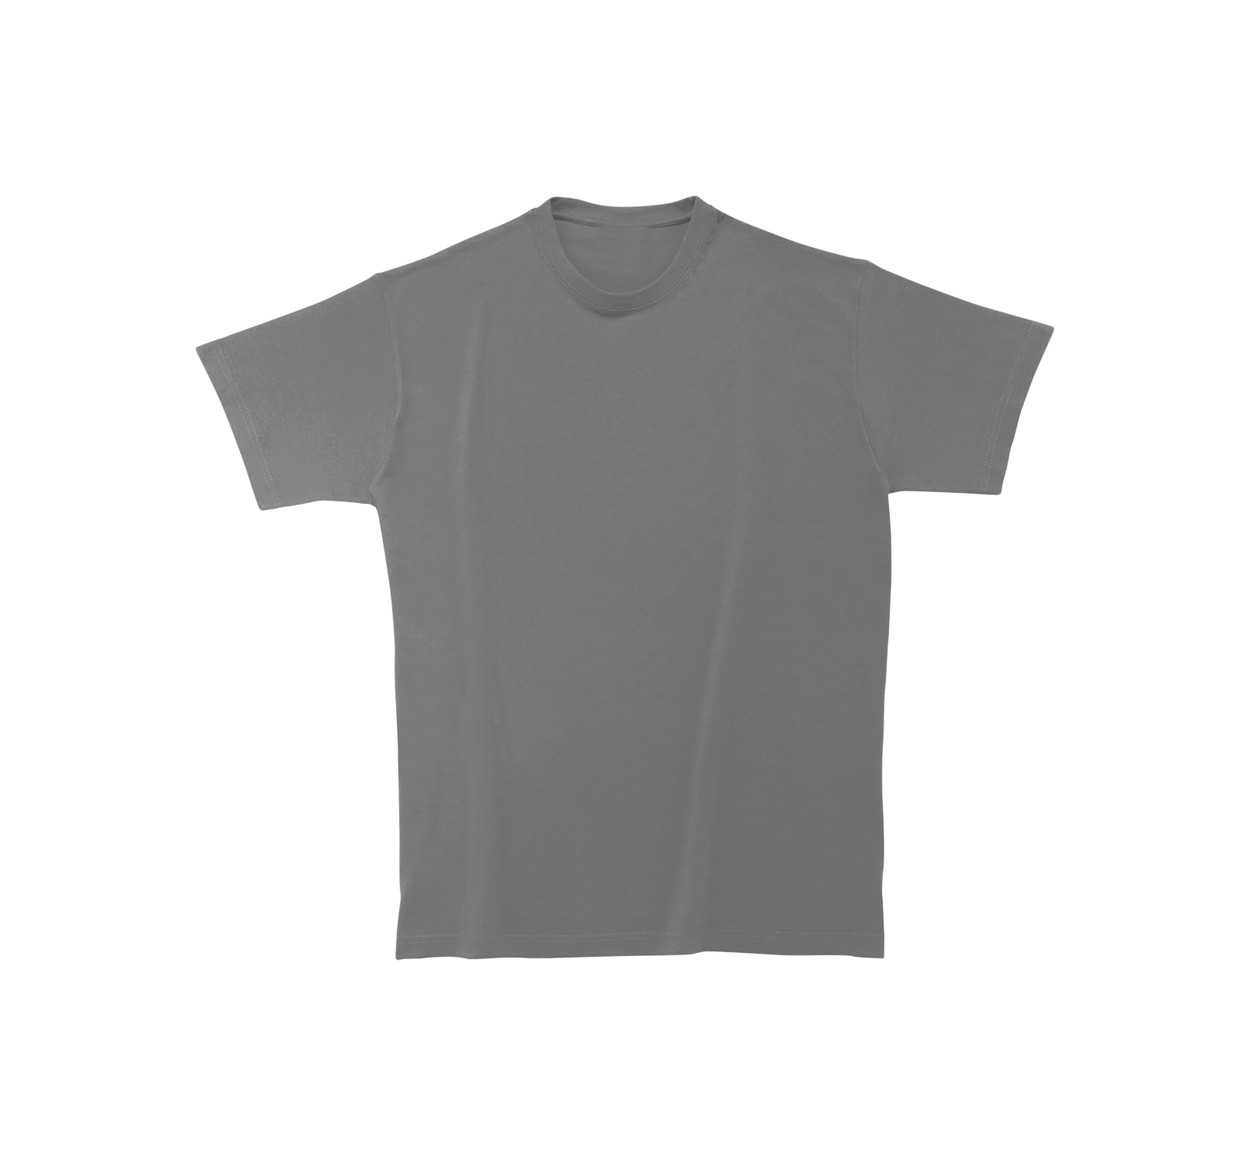 T-Shirt Heavy Cotton - Grey / XL